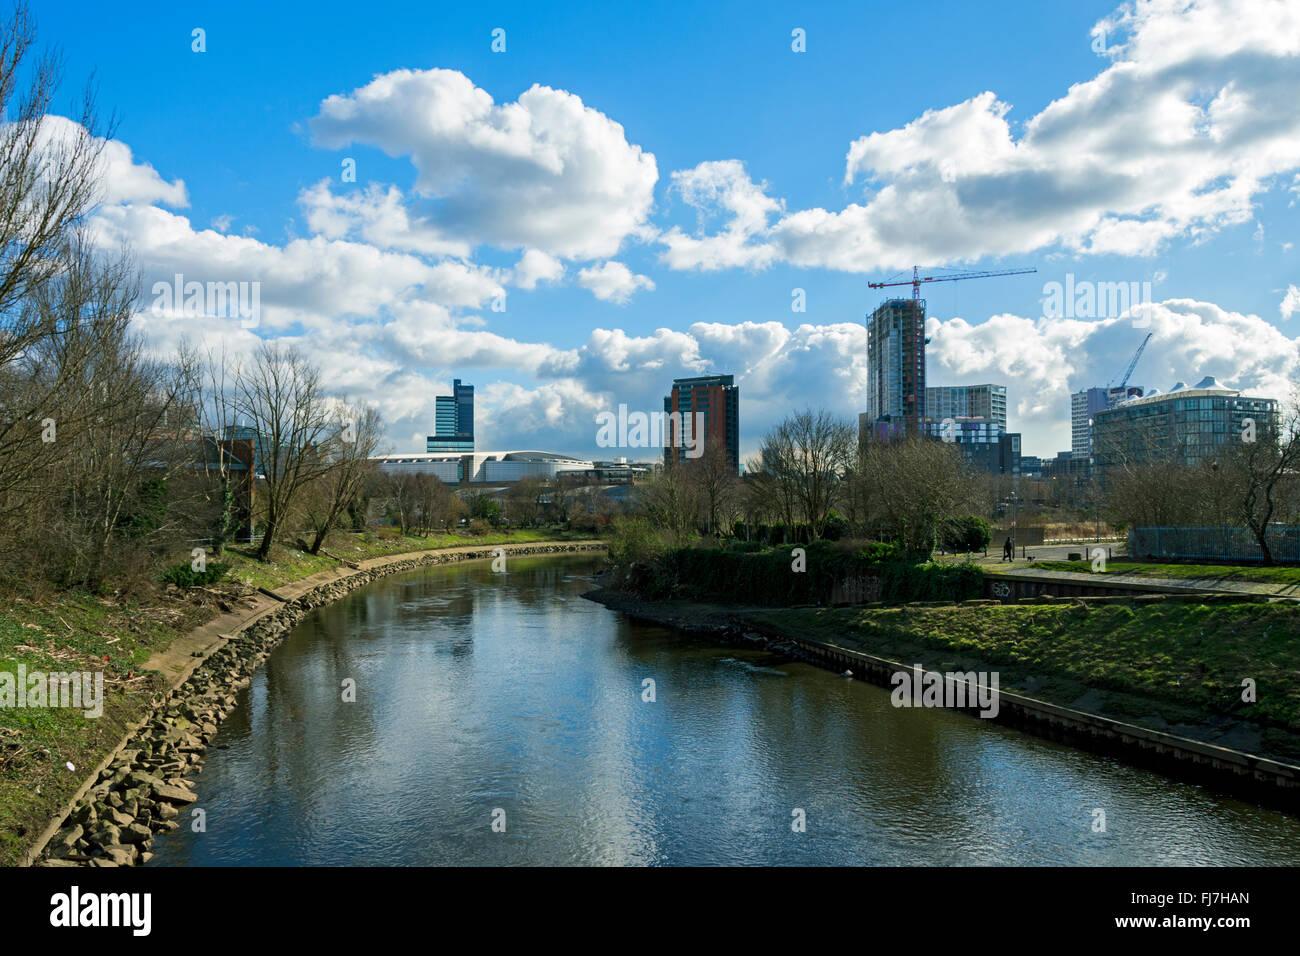 Manchester city centre skyline over the river Irwell,from Cottenham Lane footbridge, Salford, Manchester, UK - Stock Image